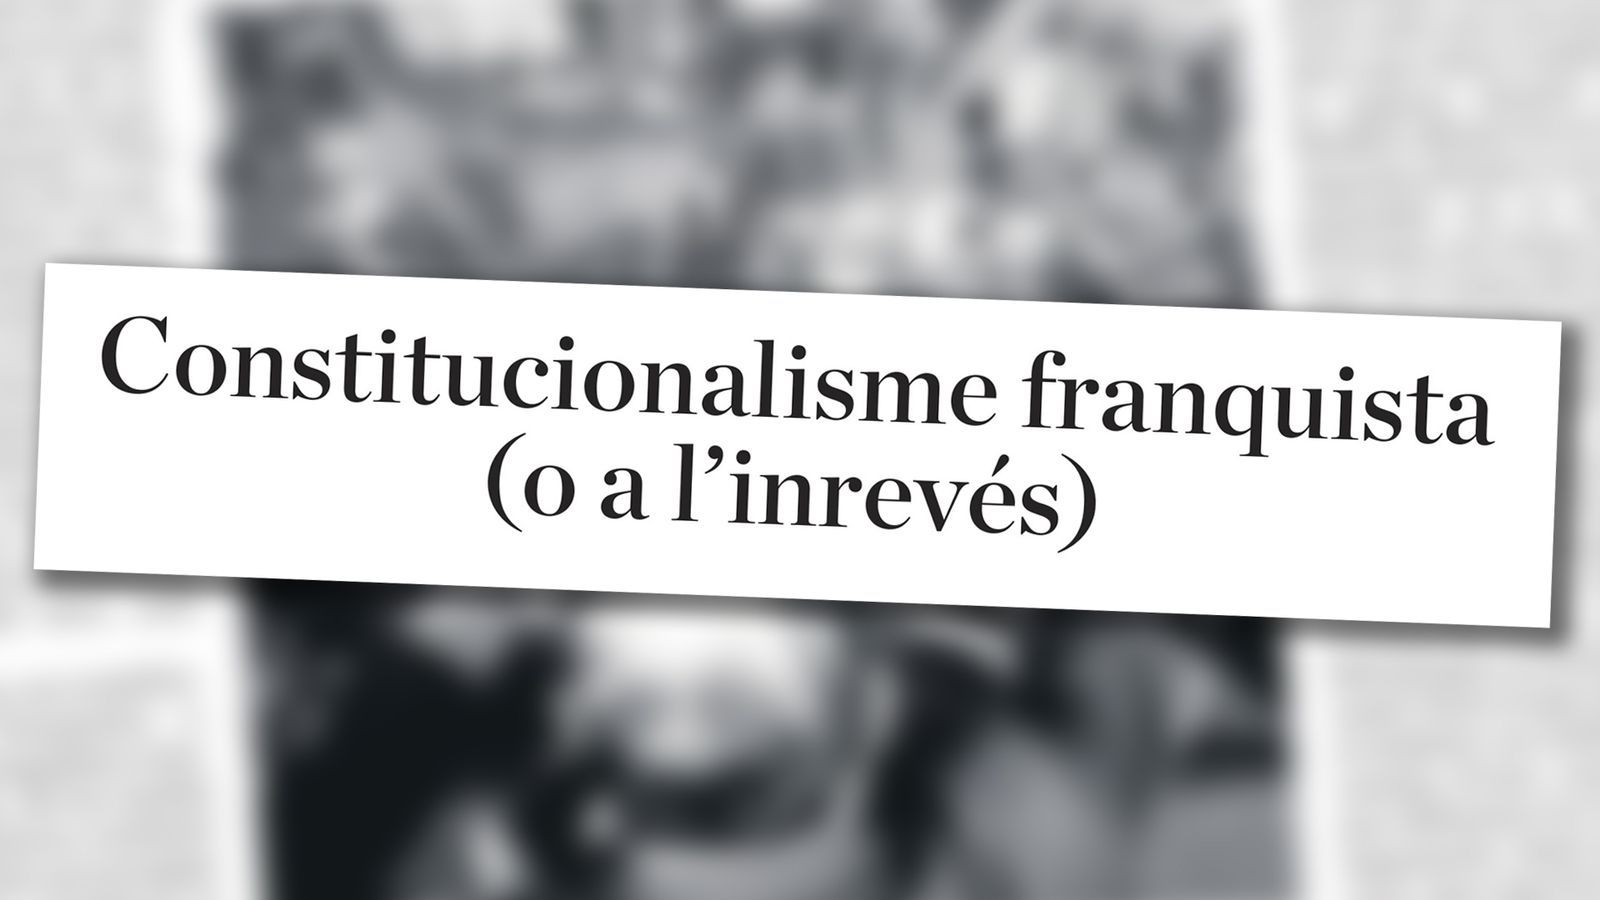 L'anàlisi d'Antoni Bassas: 'Franquisme constitucionalista'